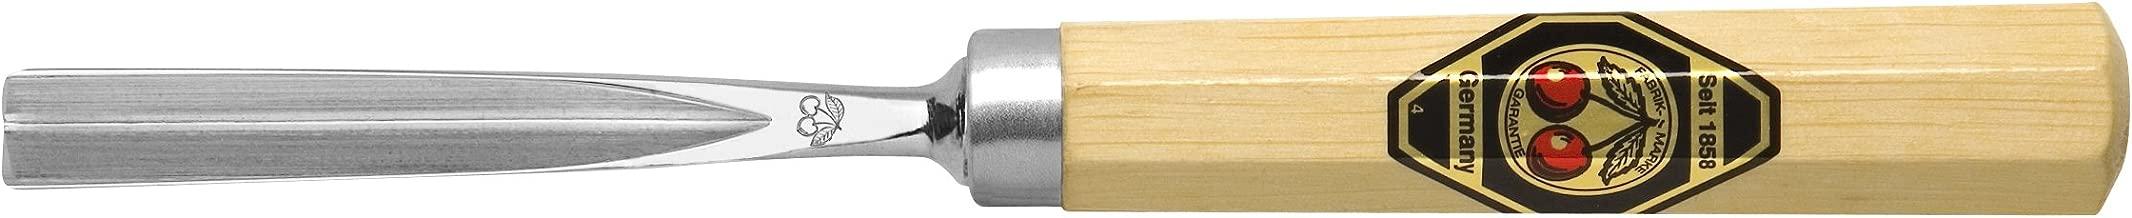 Stubai 510501 Cincel para madera 50 mm 50mm